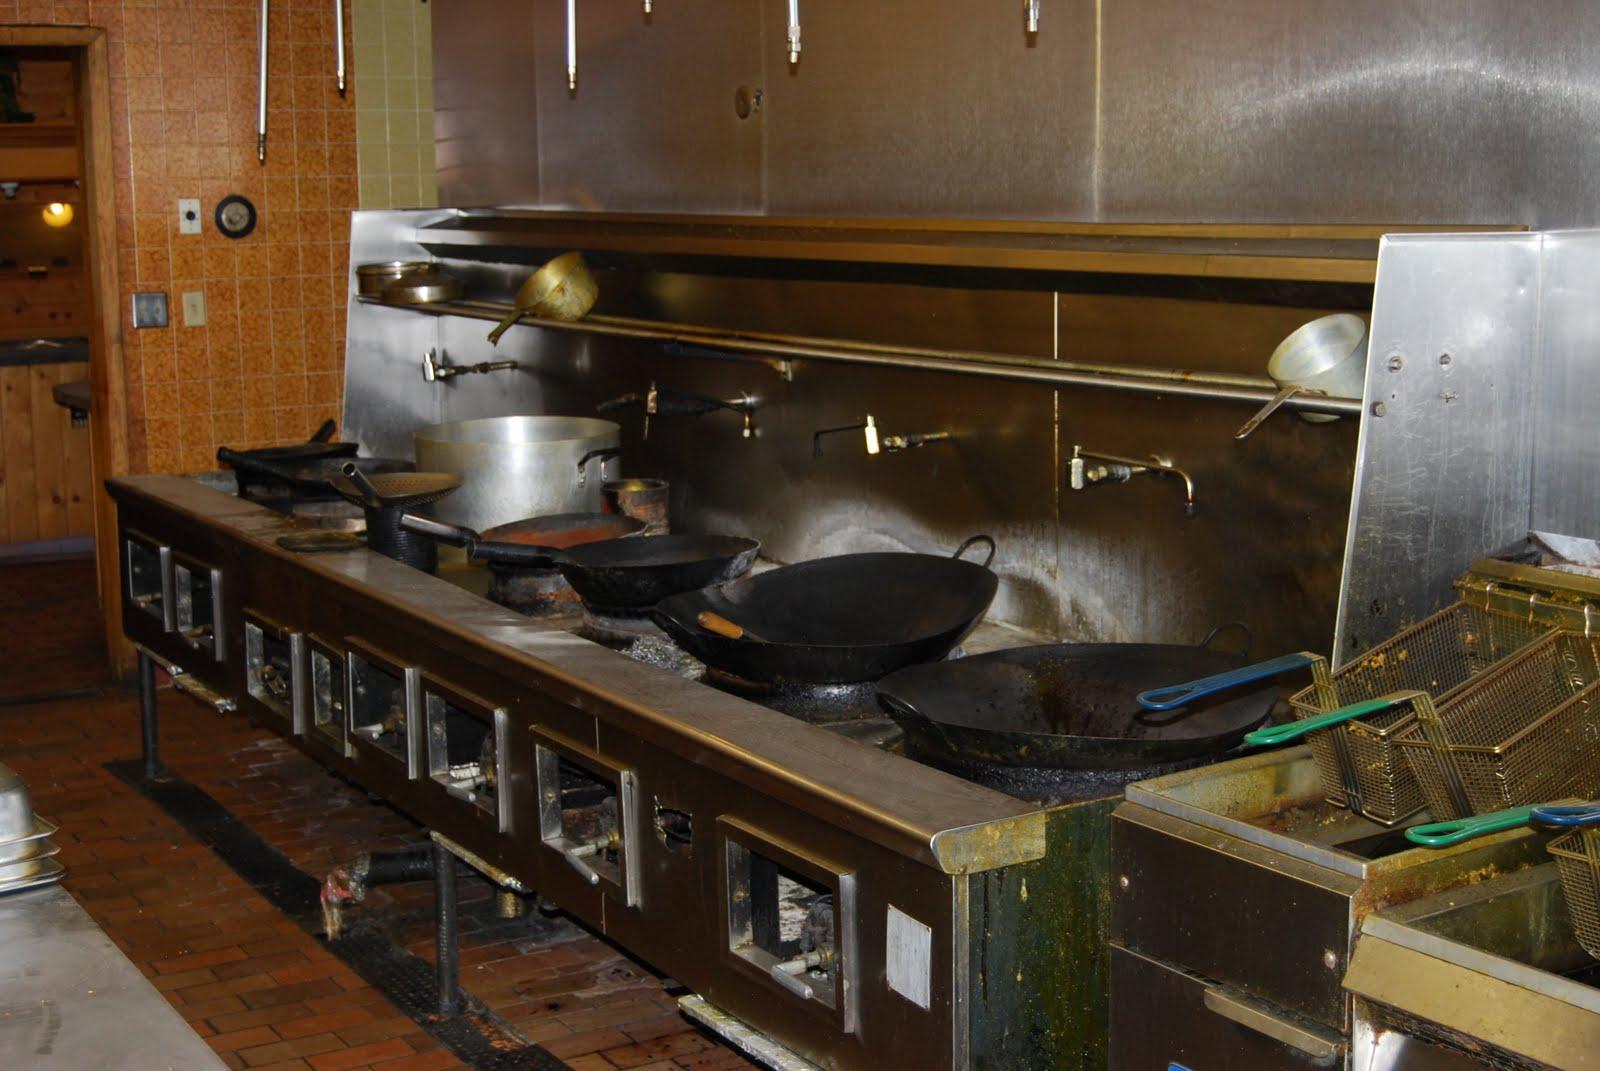 Full Restaurant Kitchen Sale: Stainless Steel 7 Burner Gas Wok ...